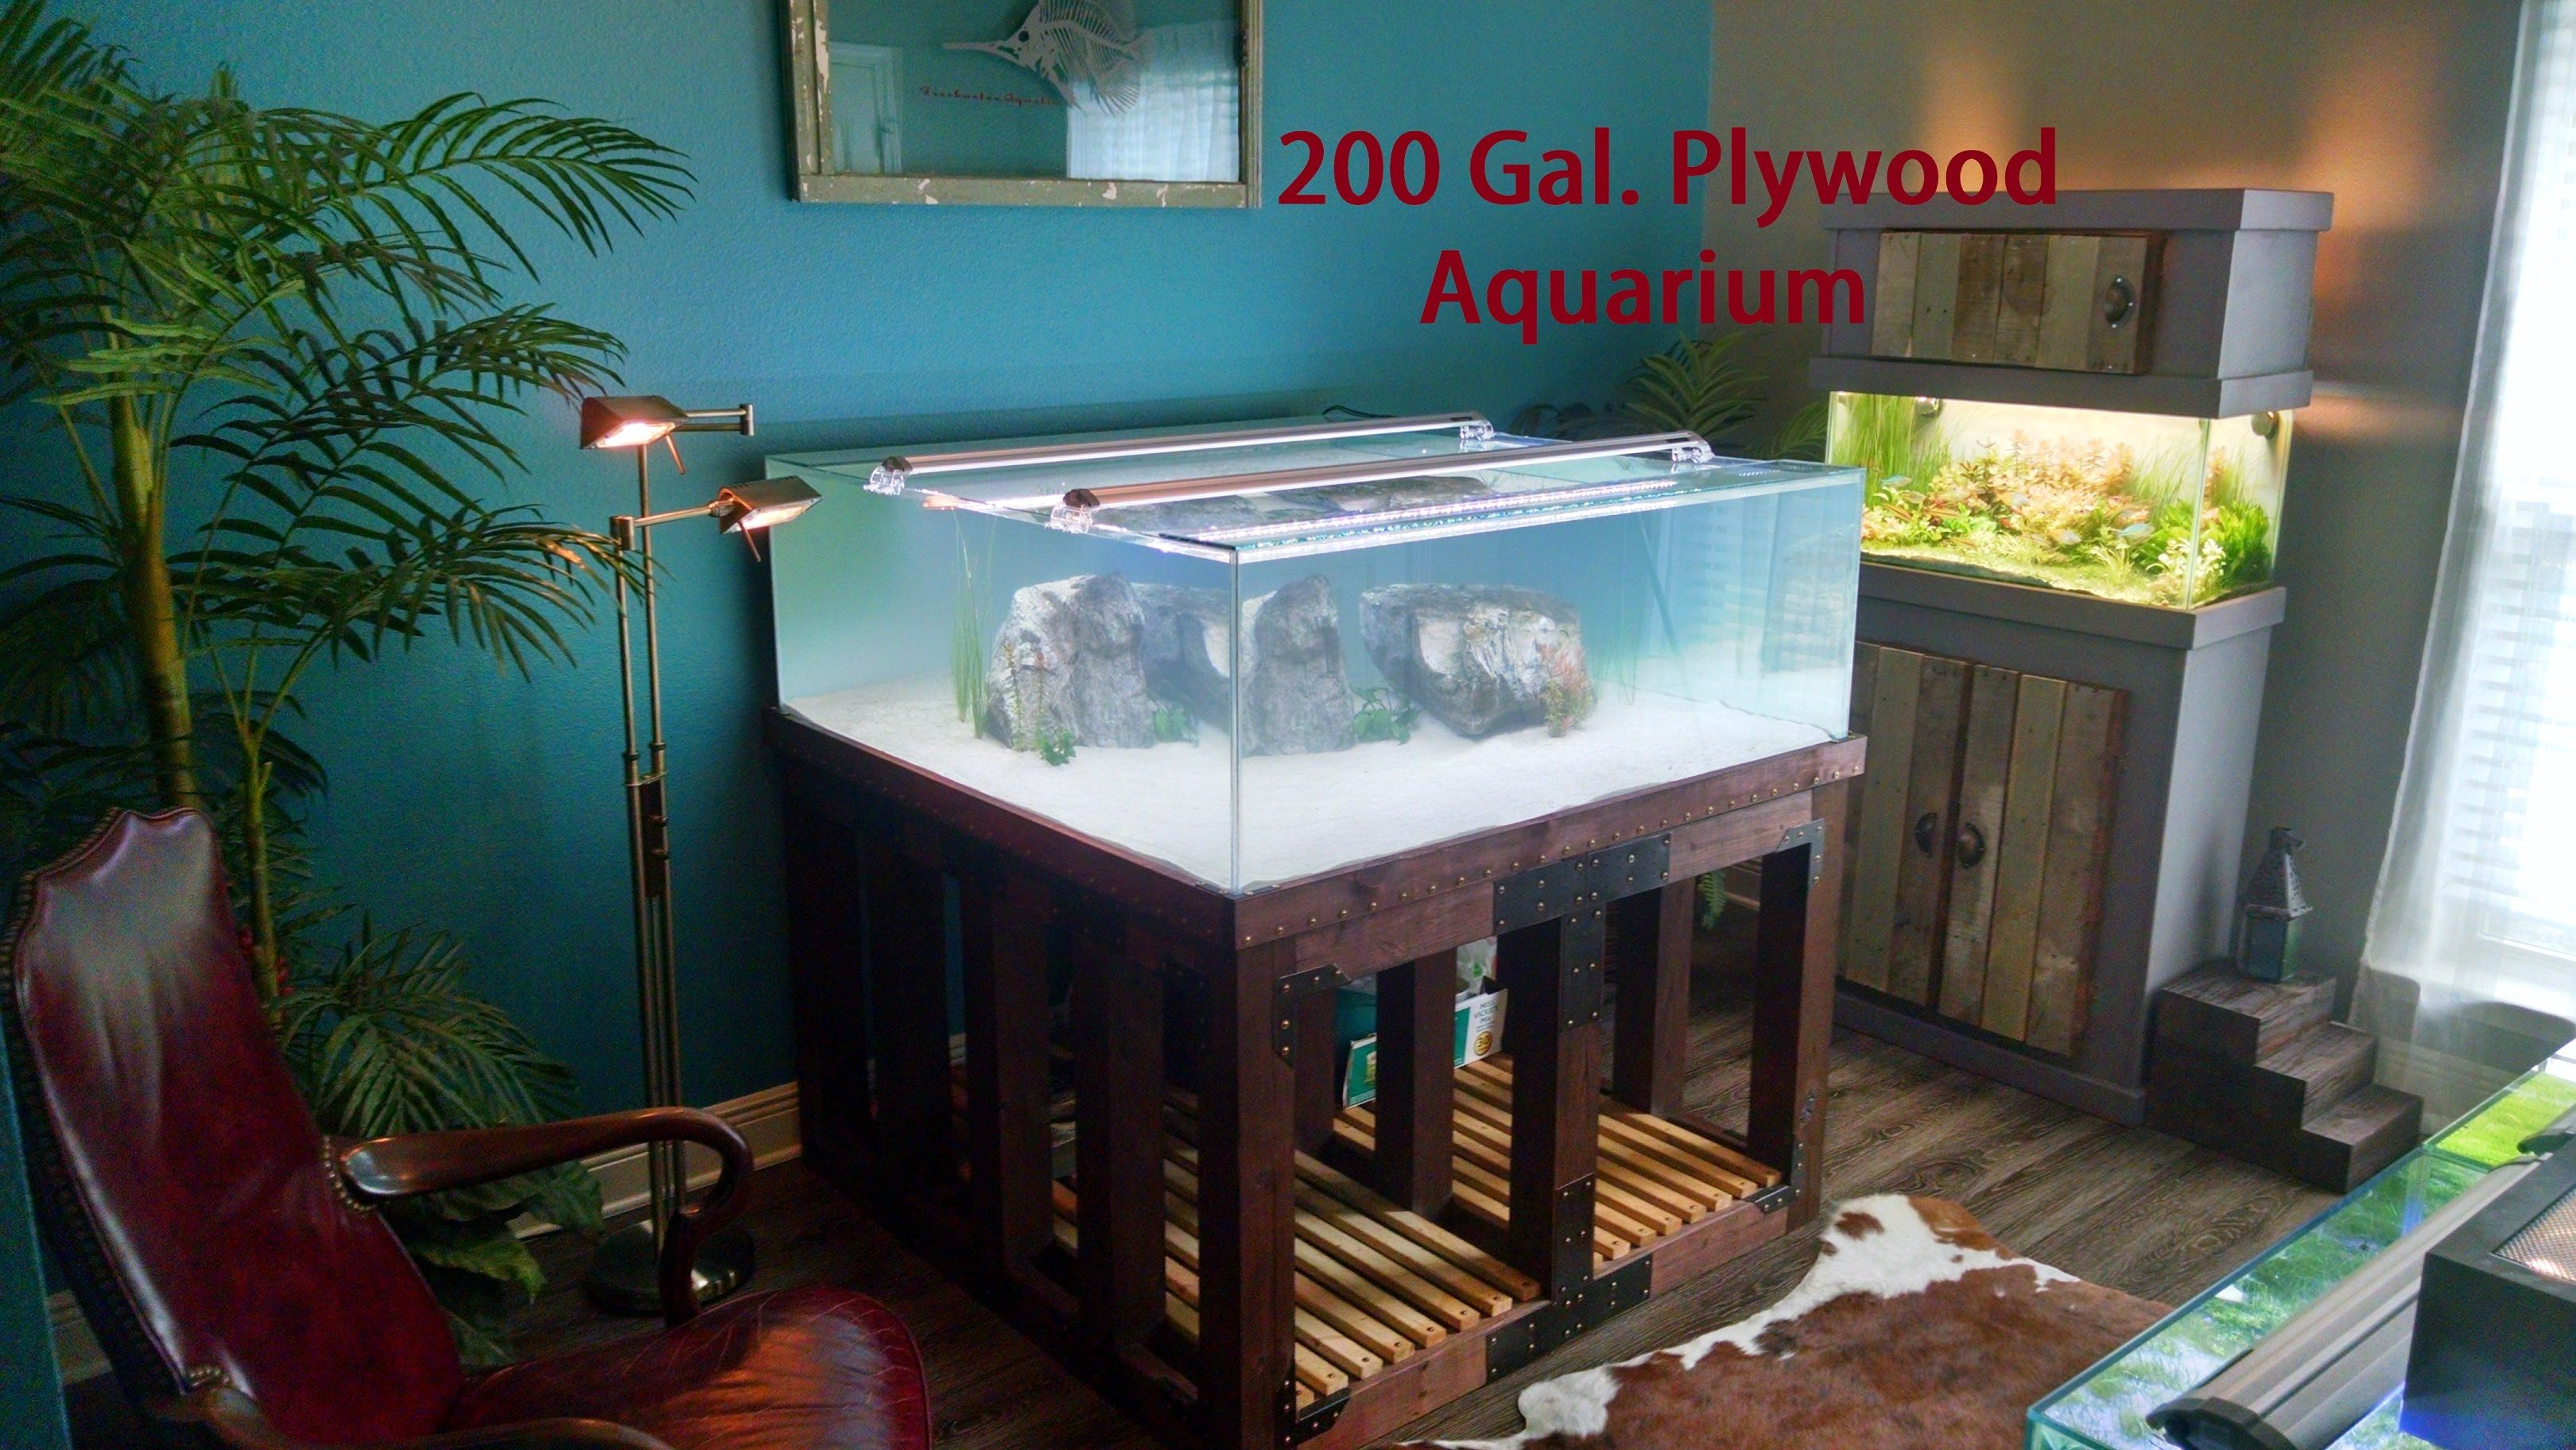 Fish in tank swimming - 200 Gallon Plywood Bottom Aquarium Aquarium Fish And Setup